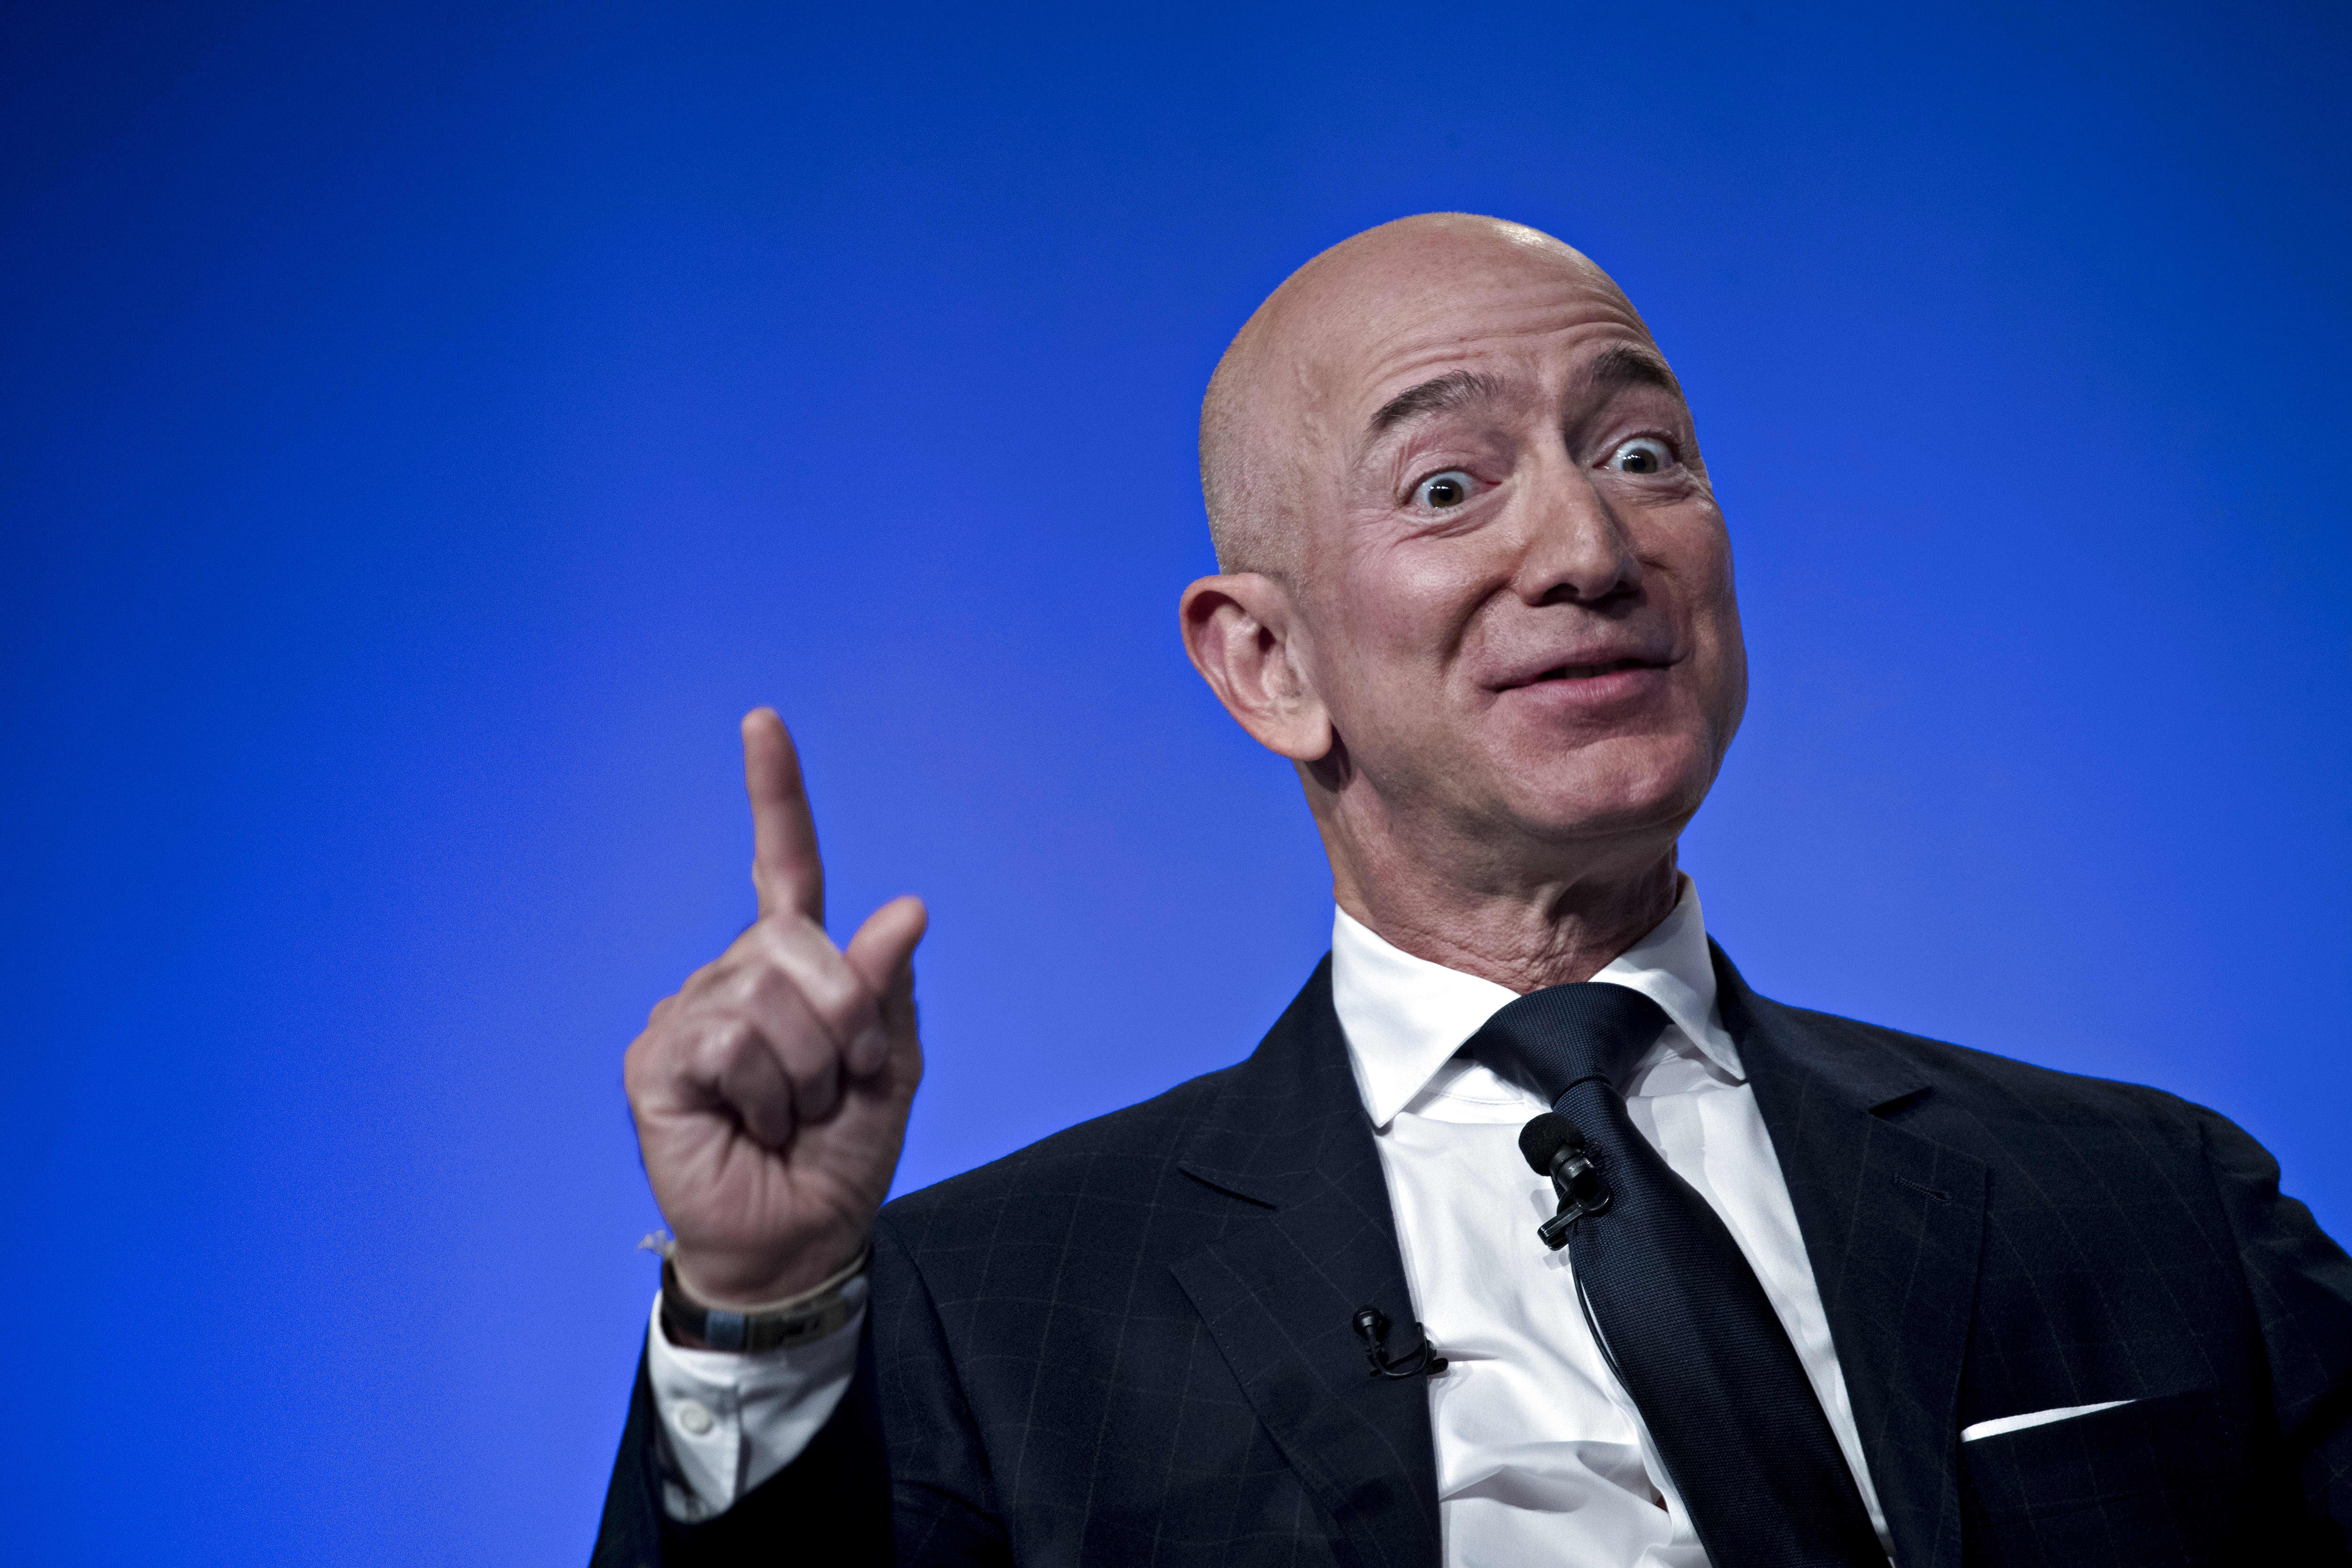 Bezos will 'break up his own company' before regulators do, Atlantic writer who profiled the CEO predicts